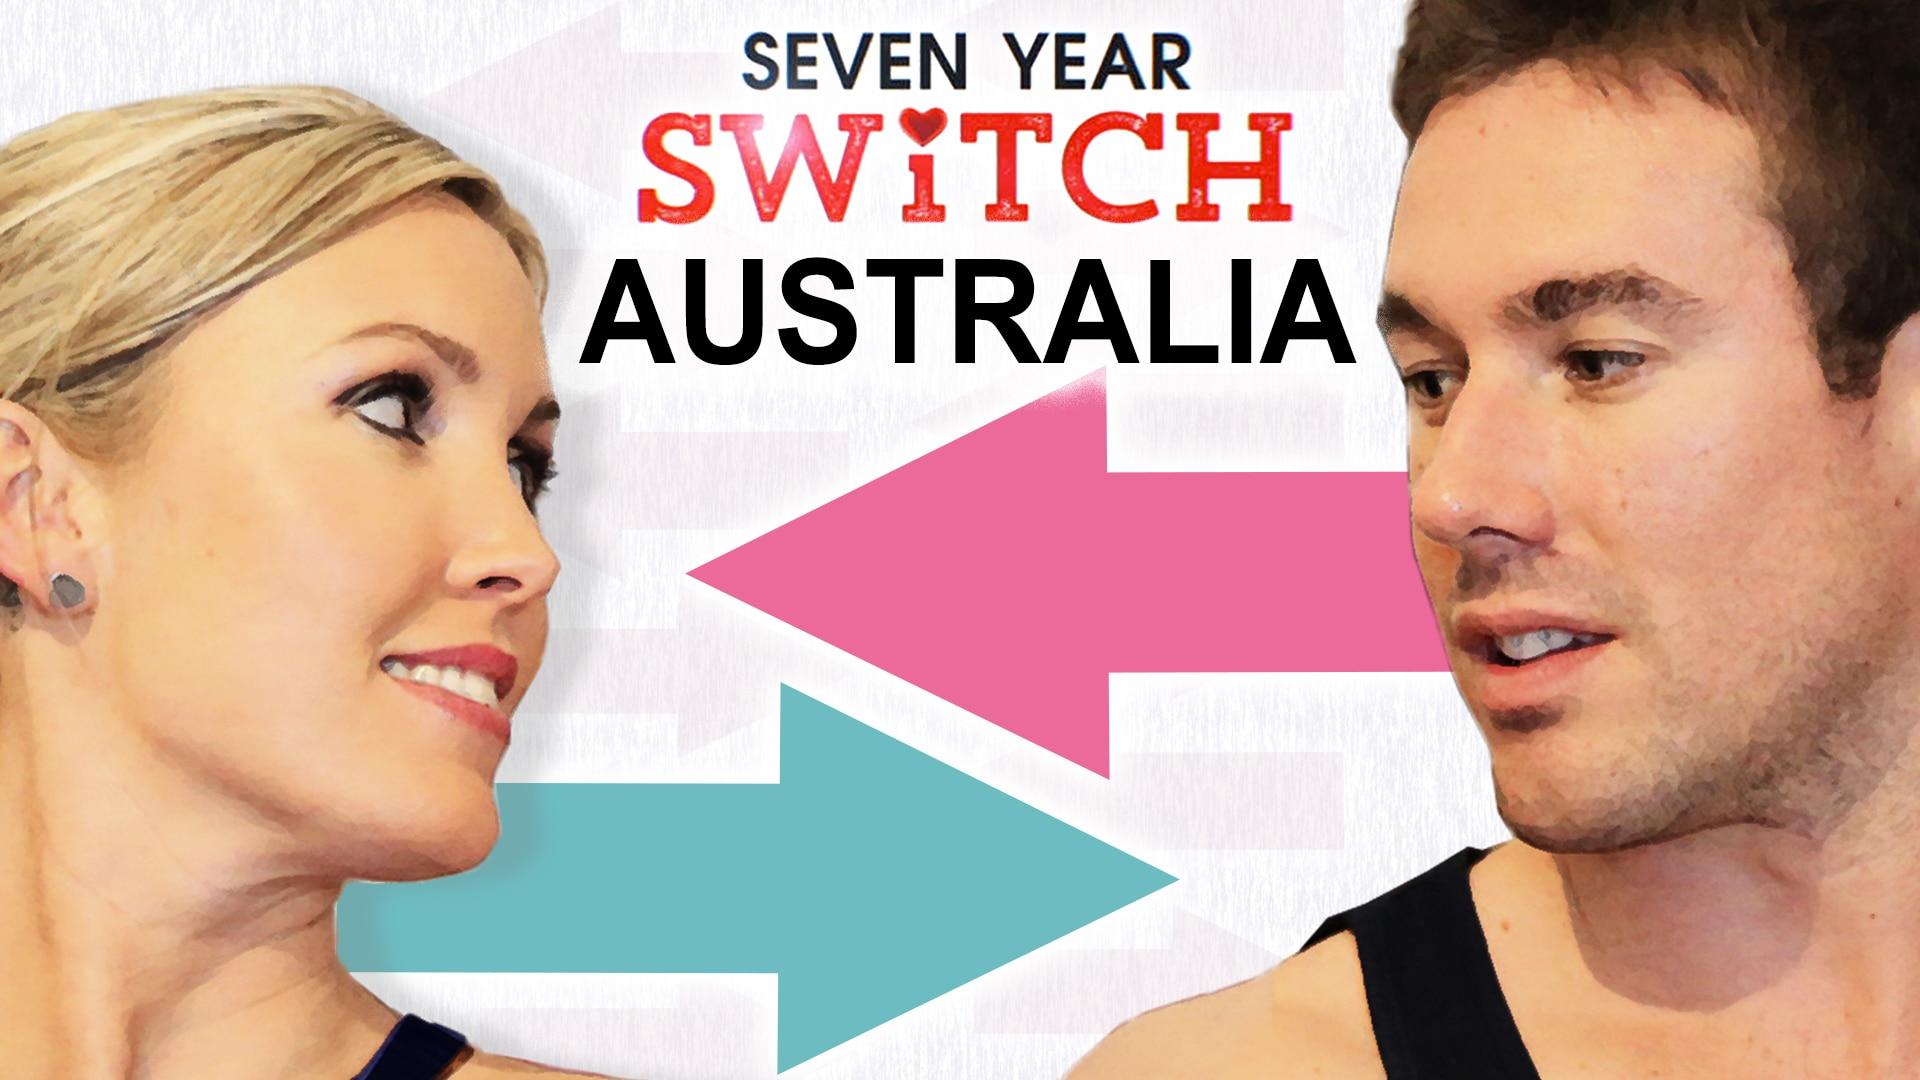 Seven Year Switch Australia